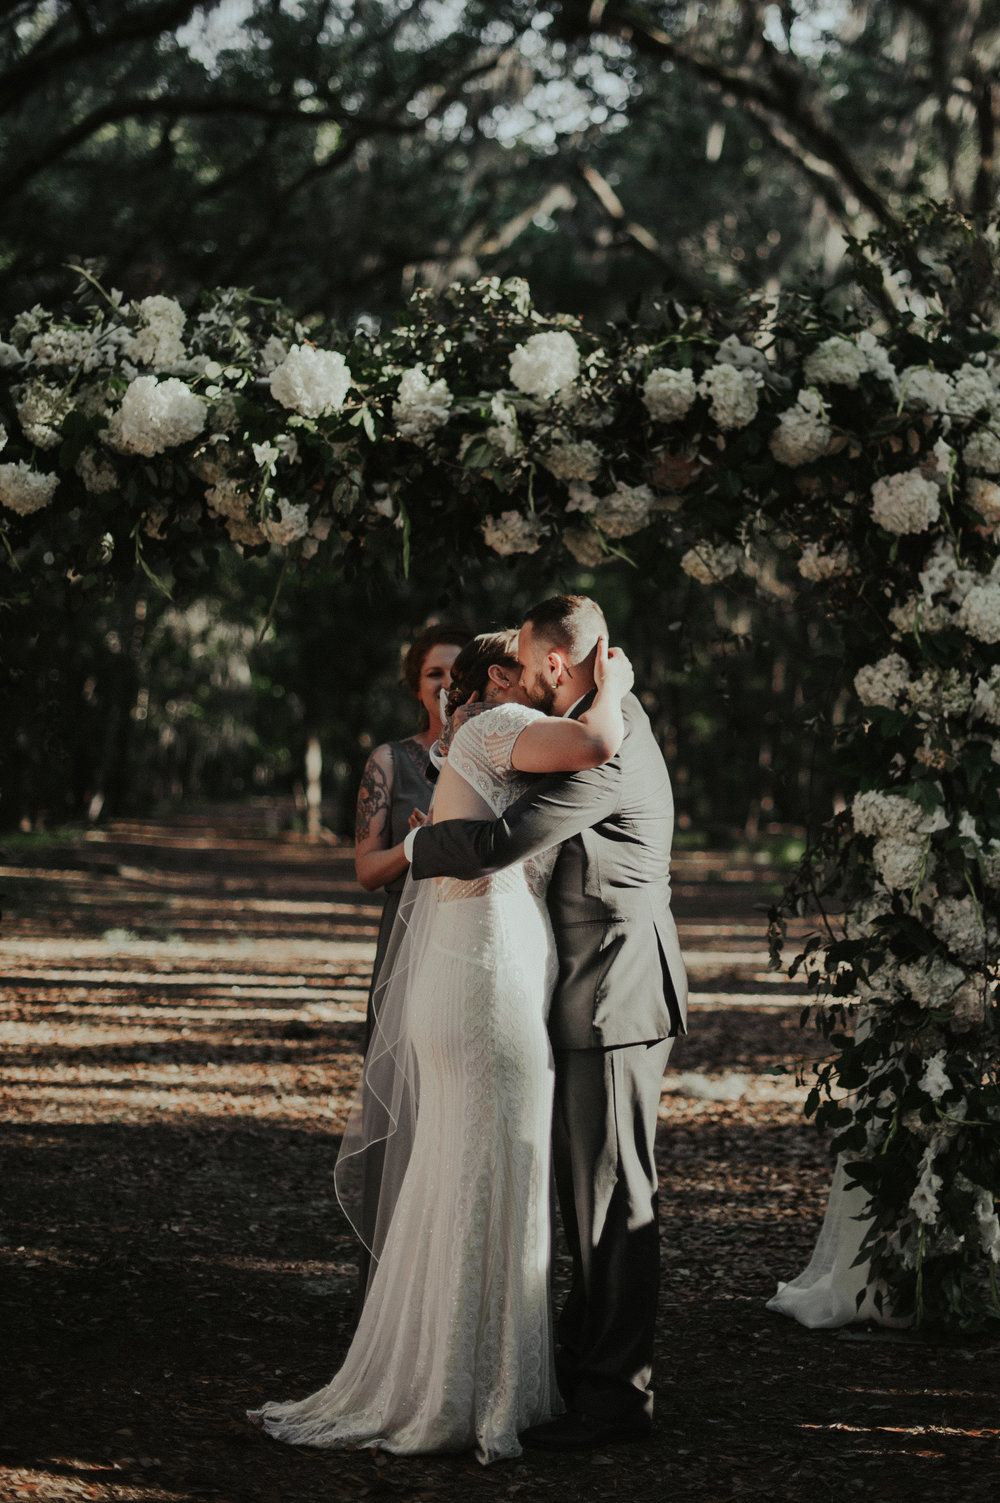 ivory-and-beau-bridal-boutique-savannah-wedding-dress-savannah-wedding-gown-savannah-bridal-boutique-savannah-bridal-shop-savannah-wedding-planner-savannah-wedding-coordinator-56.jpg